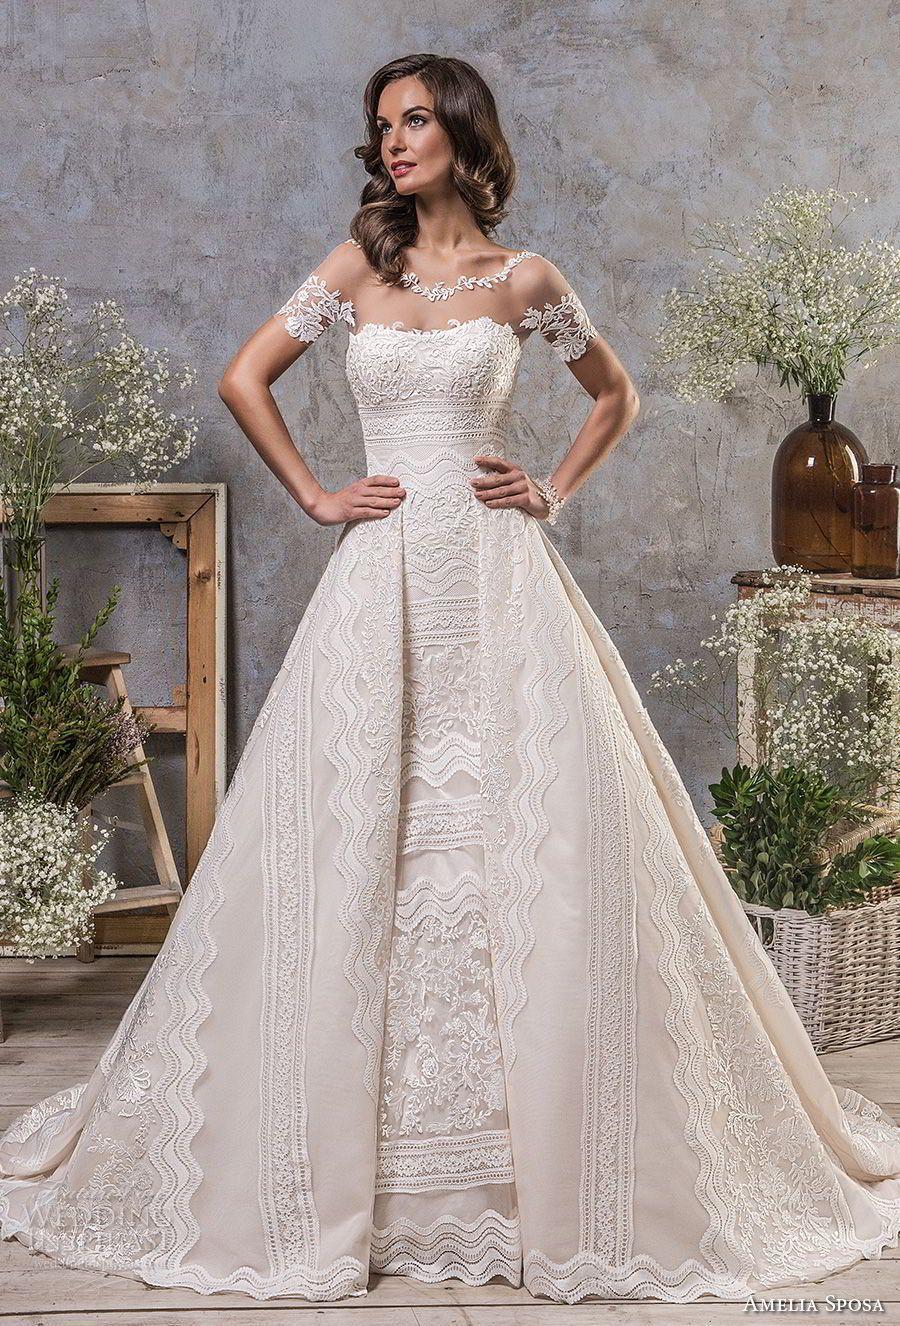 Amelia sposa fall bridal short sleeves illusion boat neck semi